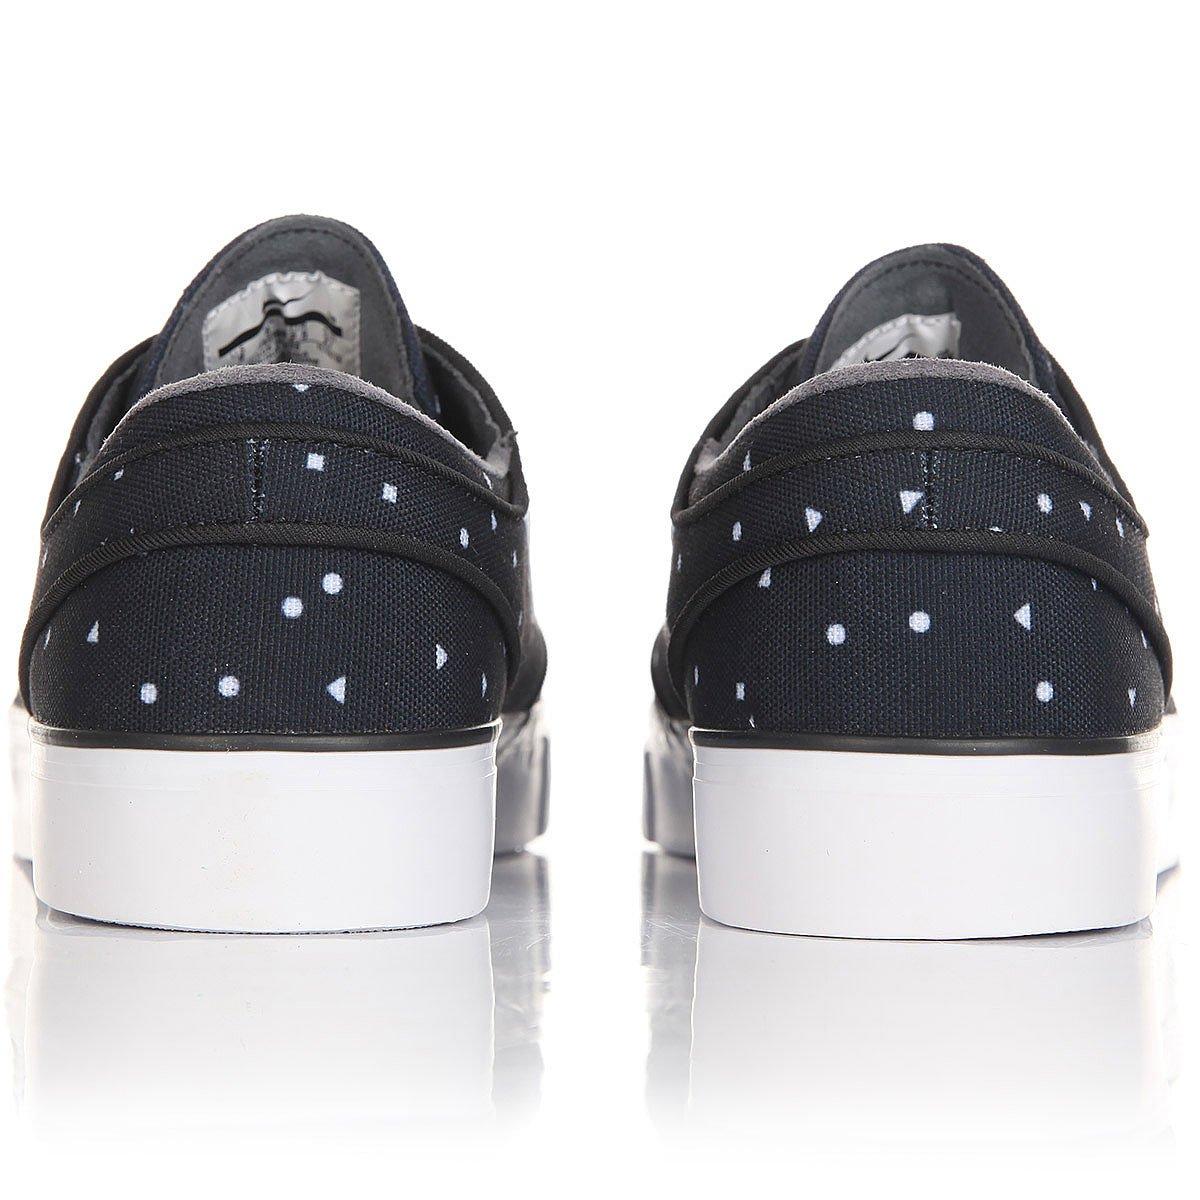 purchase cheap d994d d0e3e ... Кеды низкие Nike Zoom Stefan Janoski Cnvs Prm Black White ...